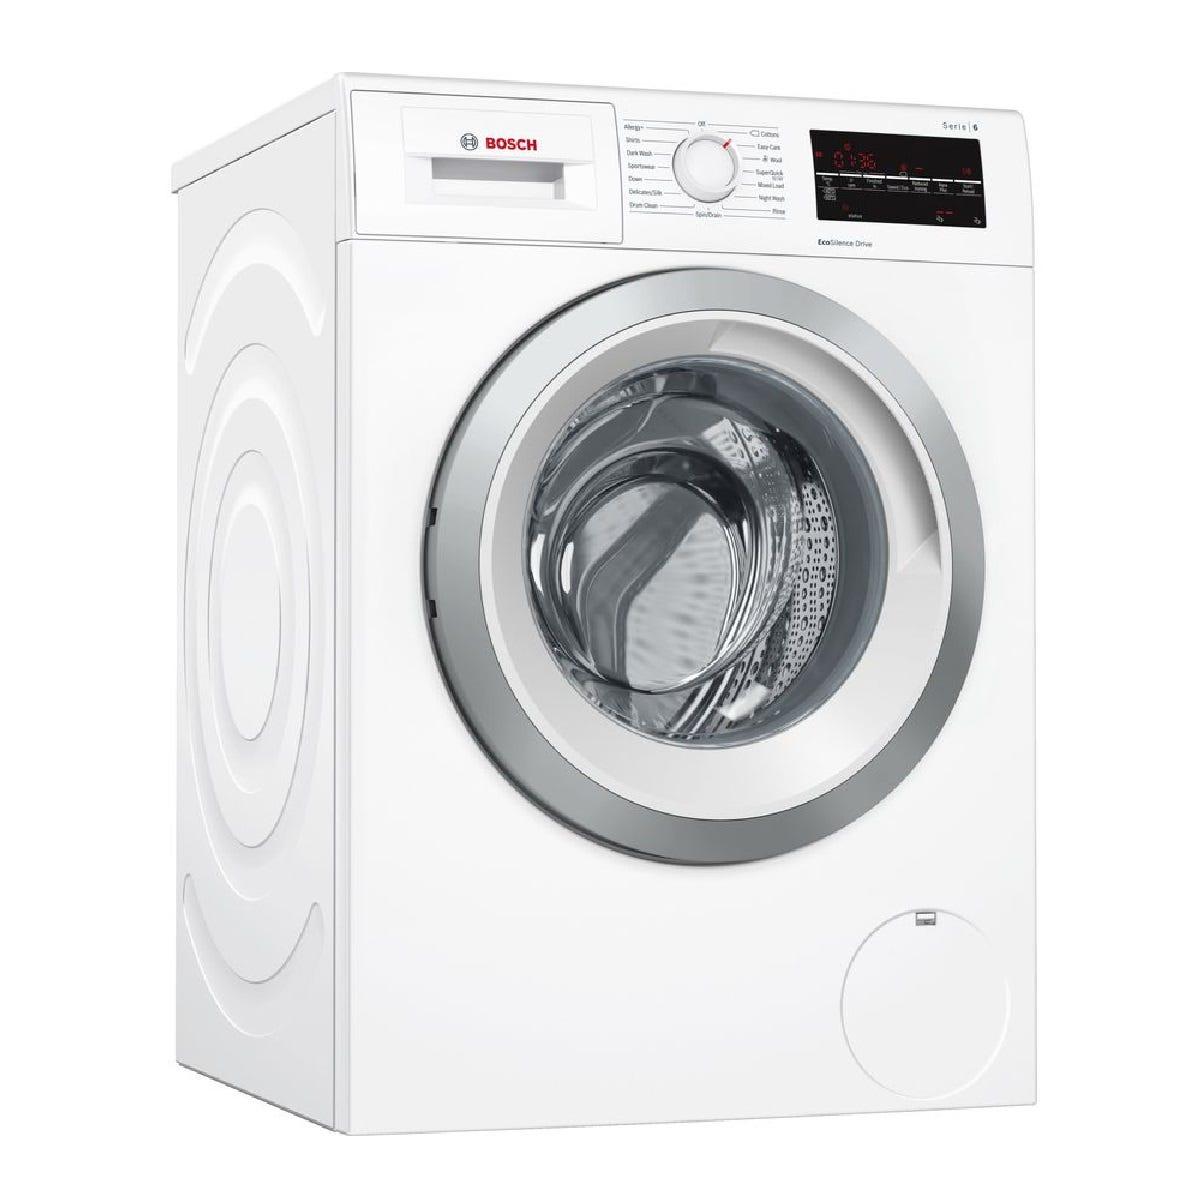 Bosch Serie 6 WAT28371GB 9kg 1400rpm Washing Machine with EcoSilence Drive - White